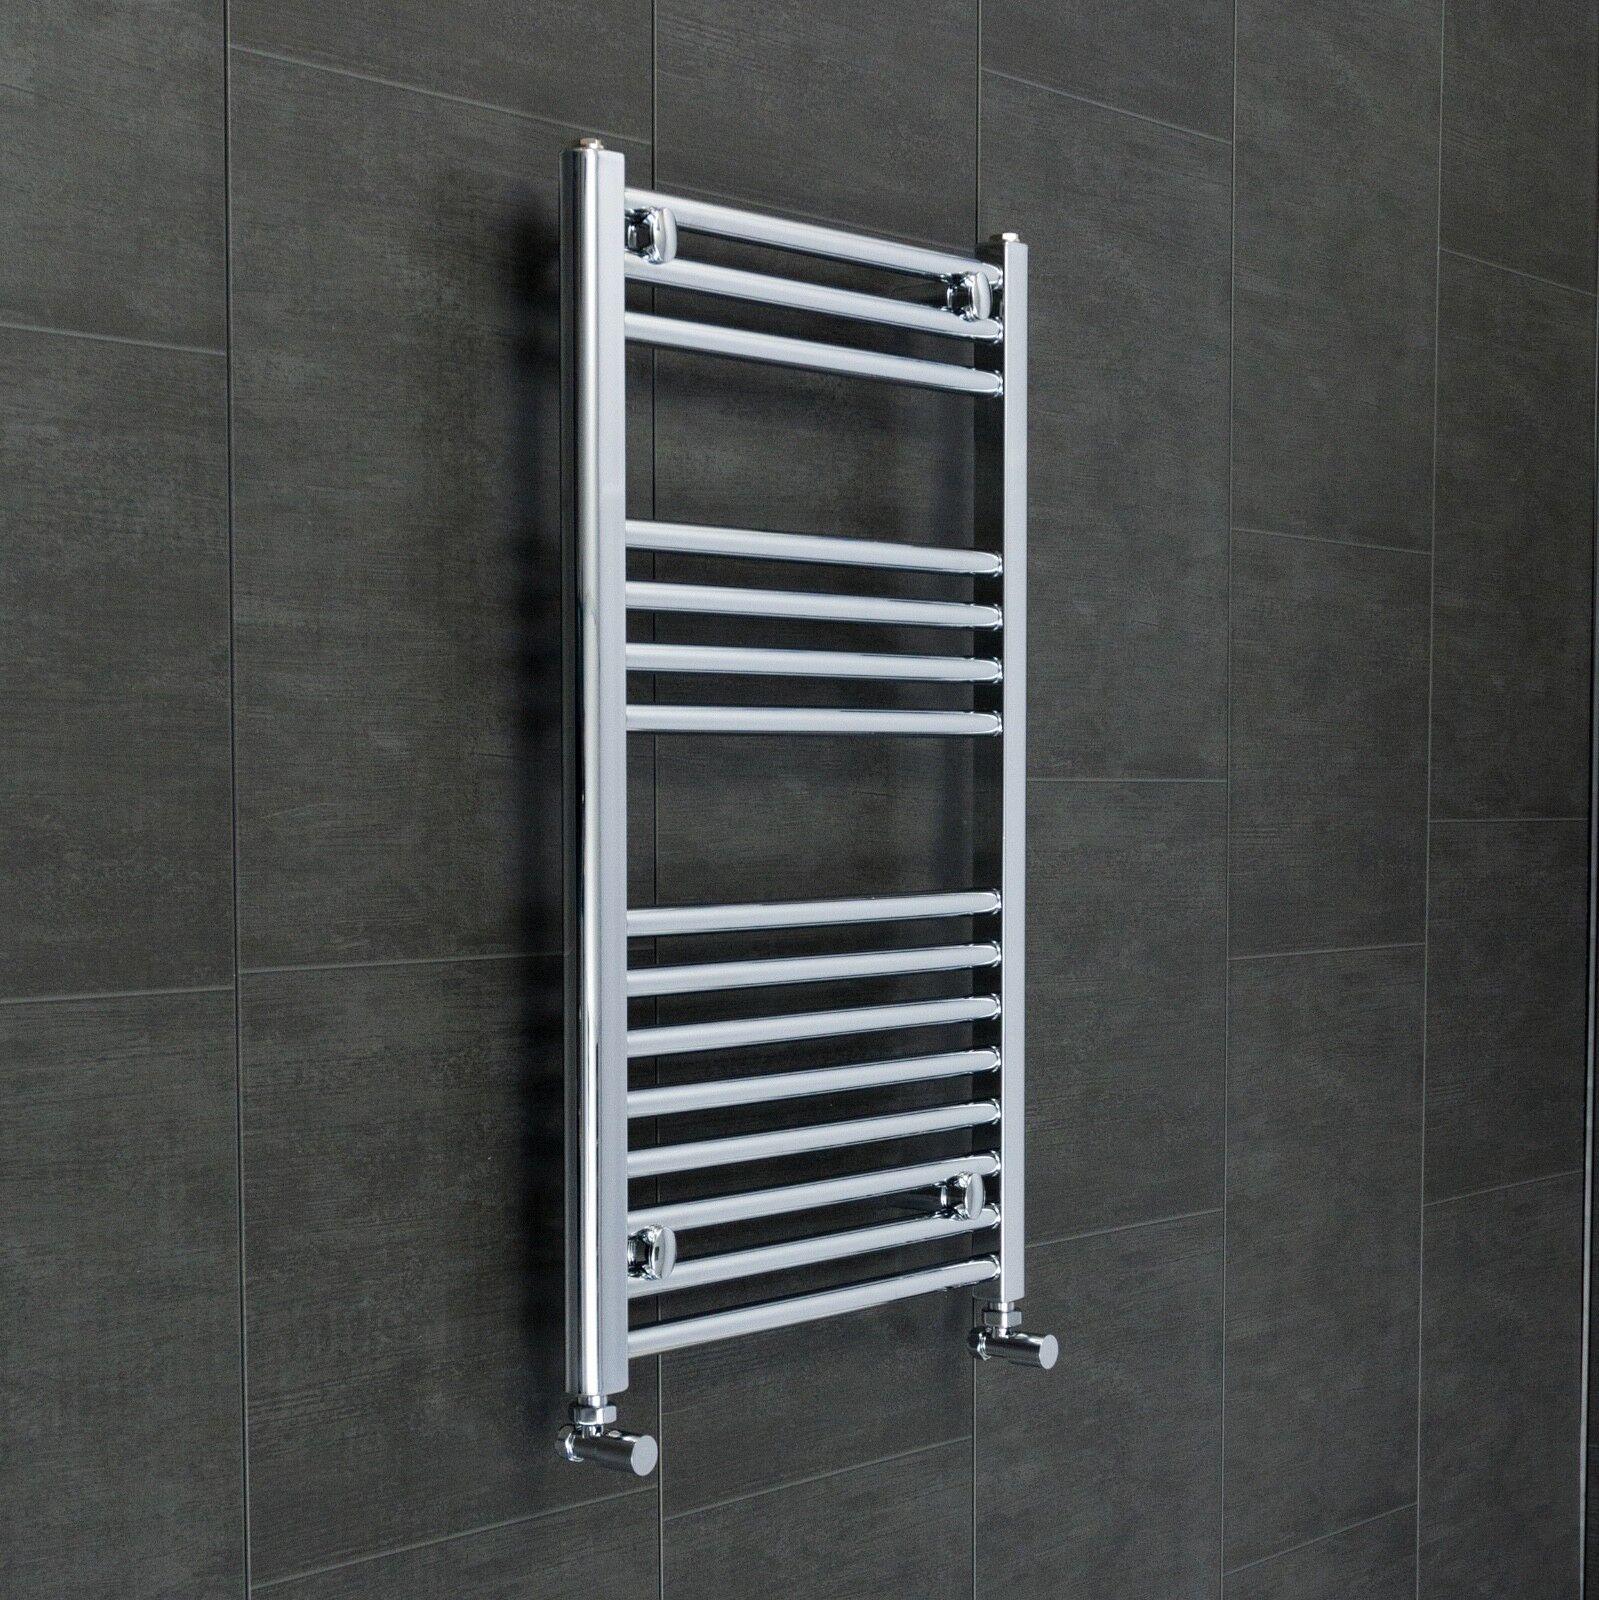 Chauffage Central Porte-serviettes Rad chauffage central salle de bains radiateur 500 mm Large NEUF